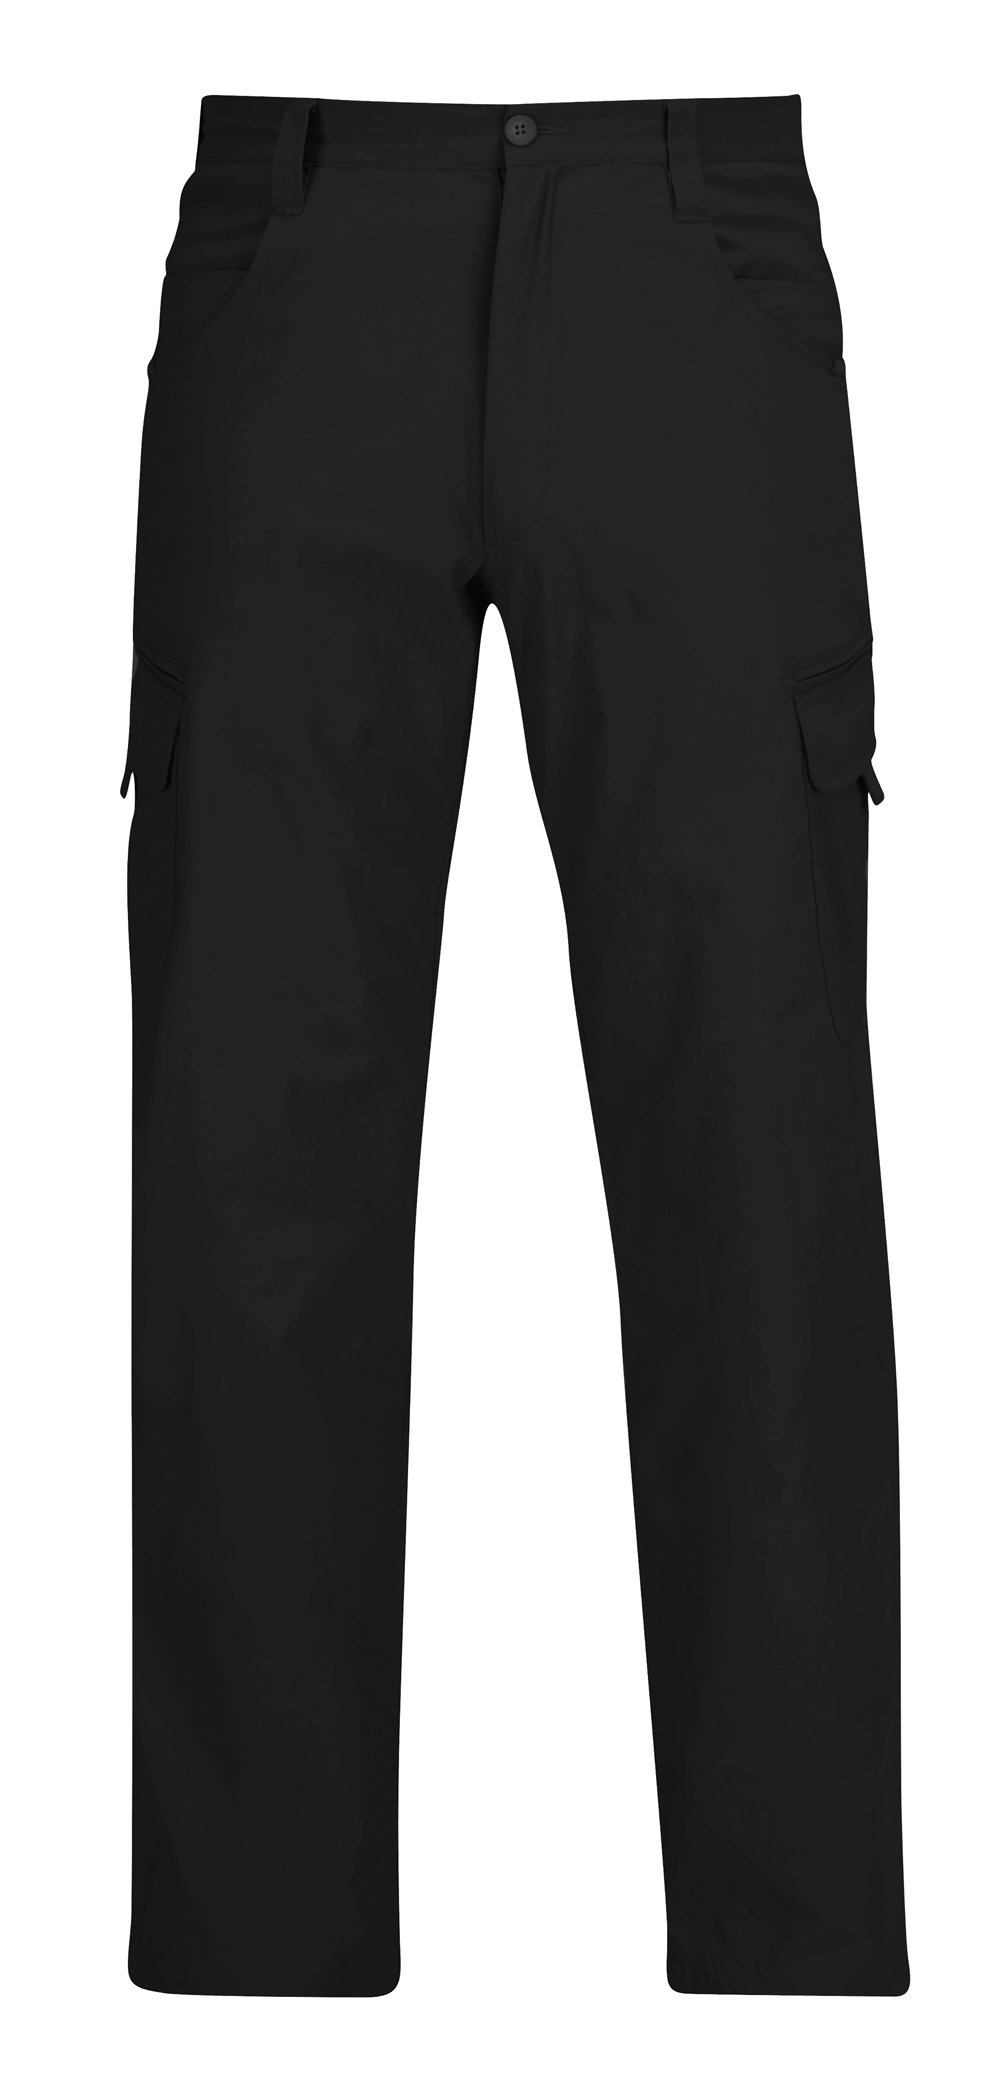 Propper Men's Summerweight Tactical Pant.